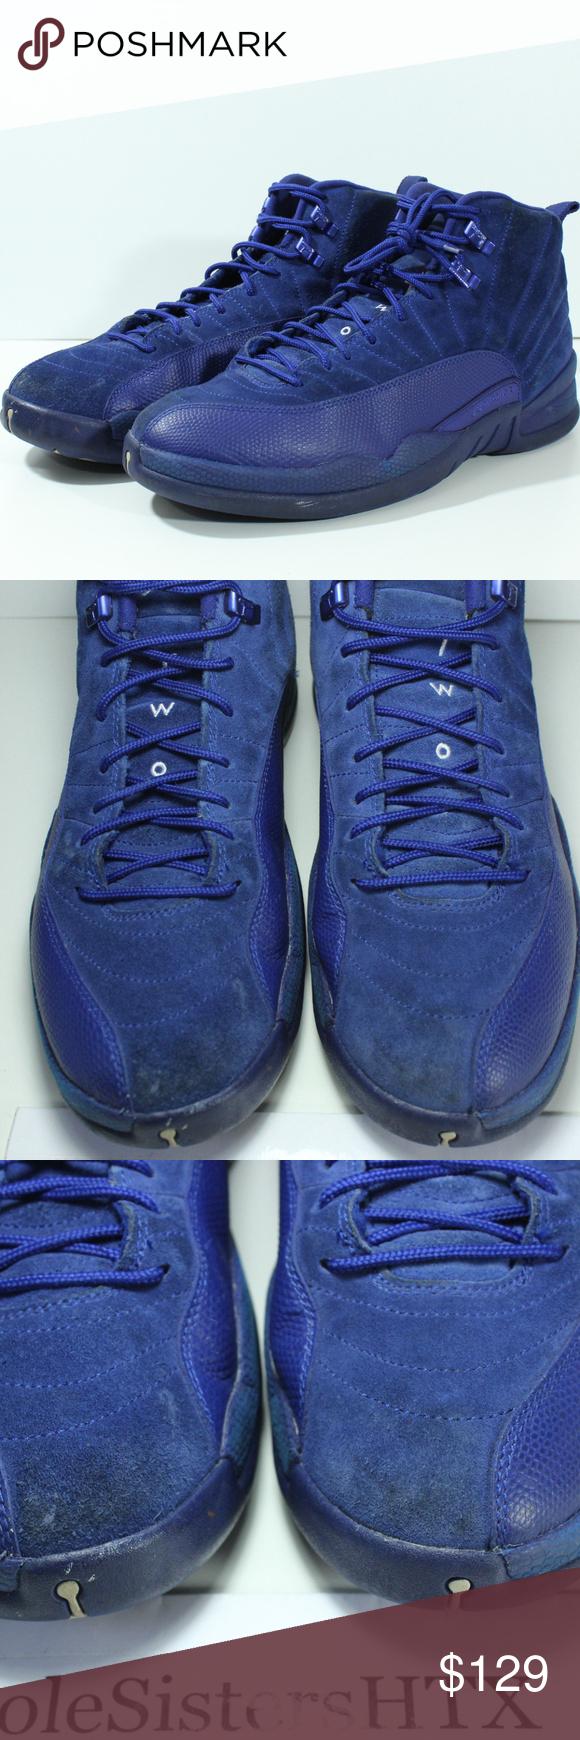 c04255488e58 Nike Air Jordan 12 XII Retro Deep Royal Blue Suede 100% Authentic Nike Air  Jordan